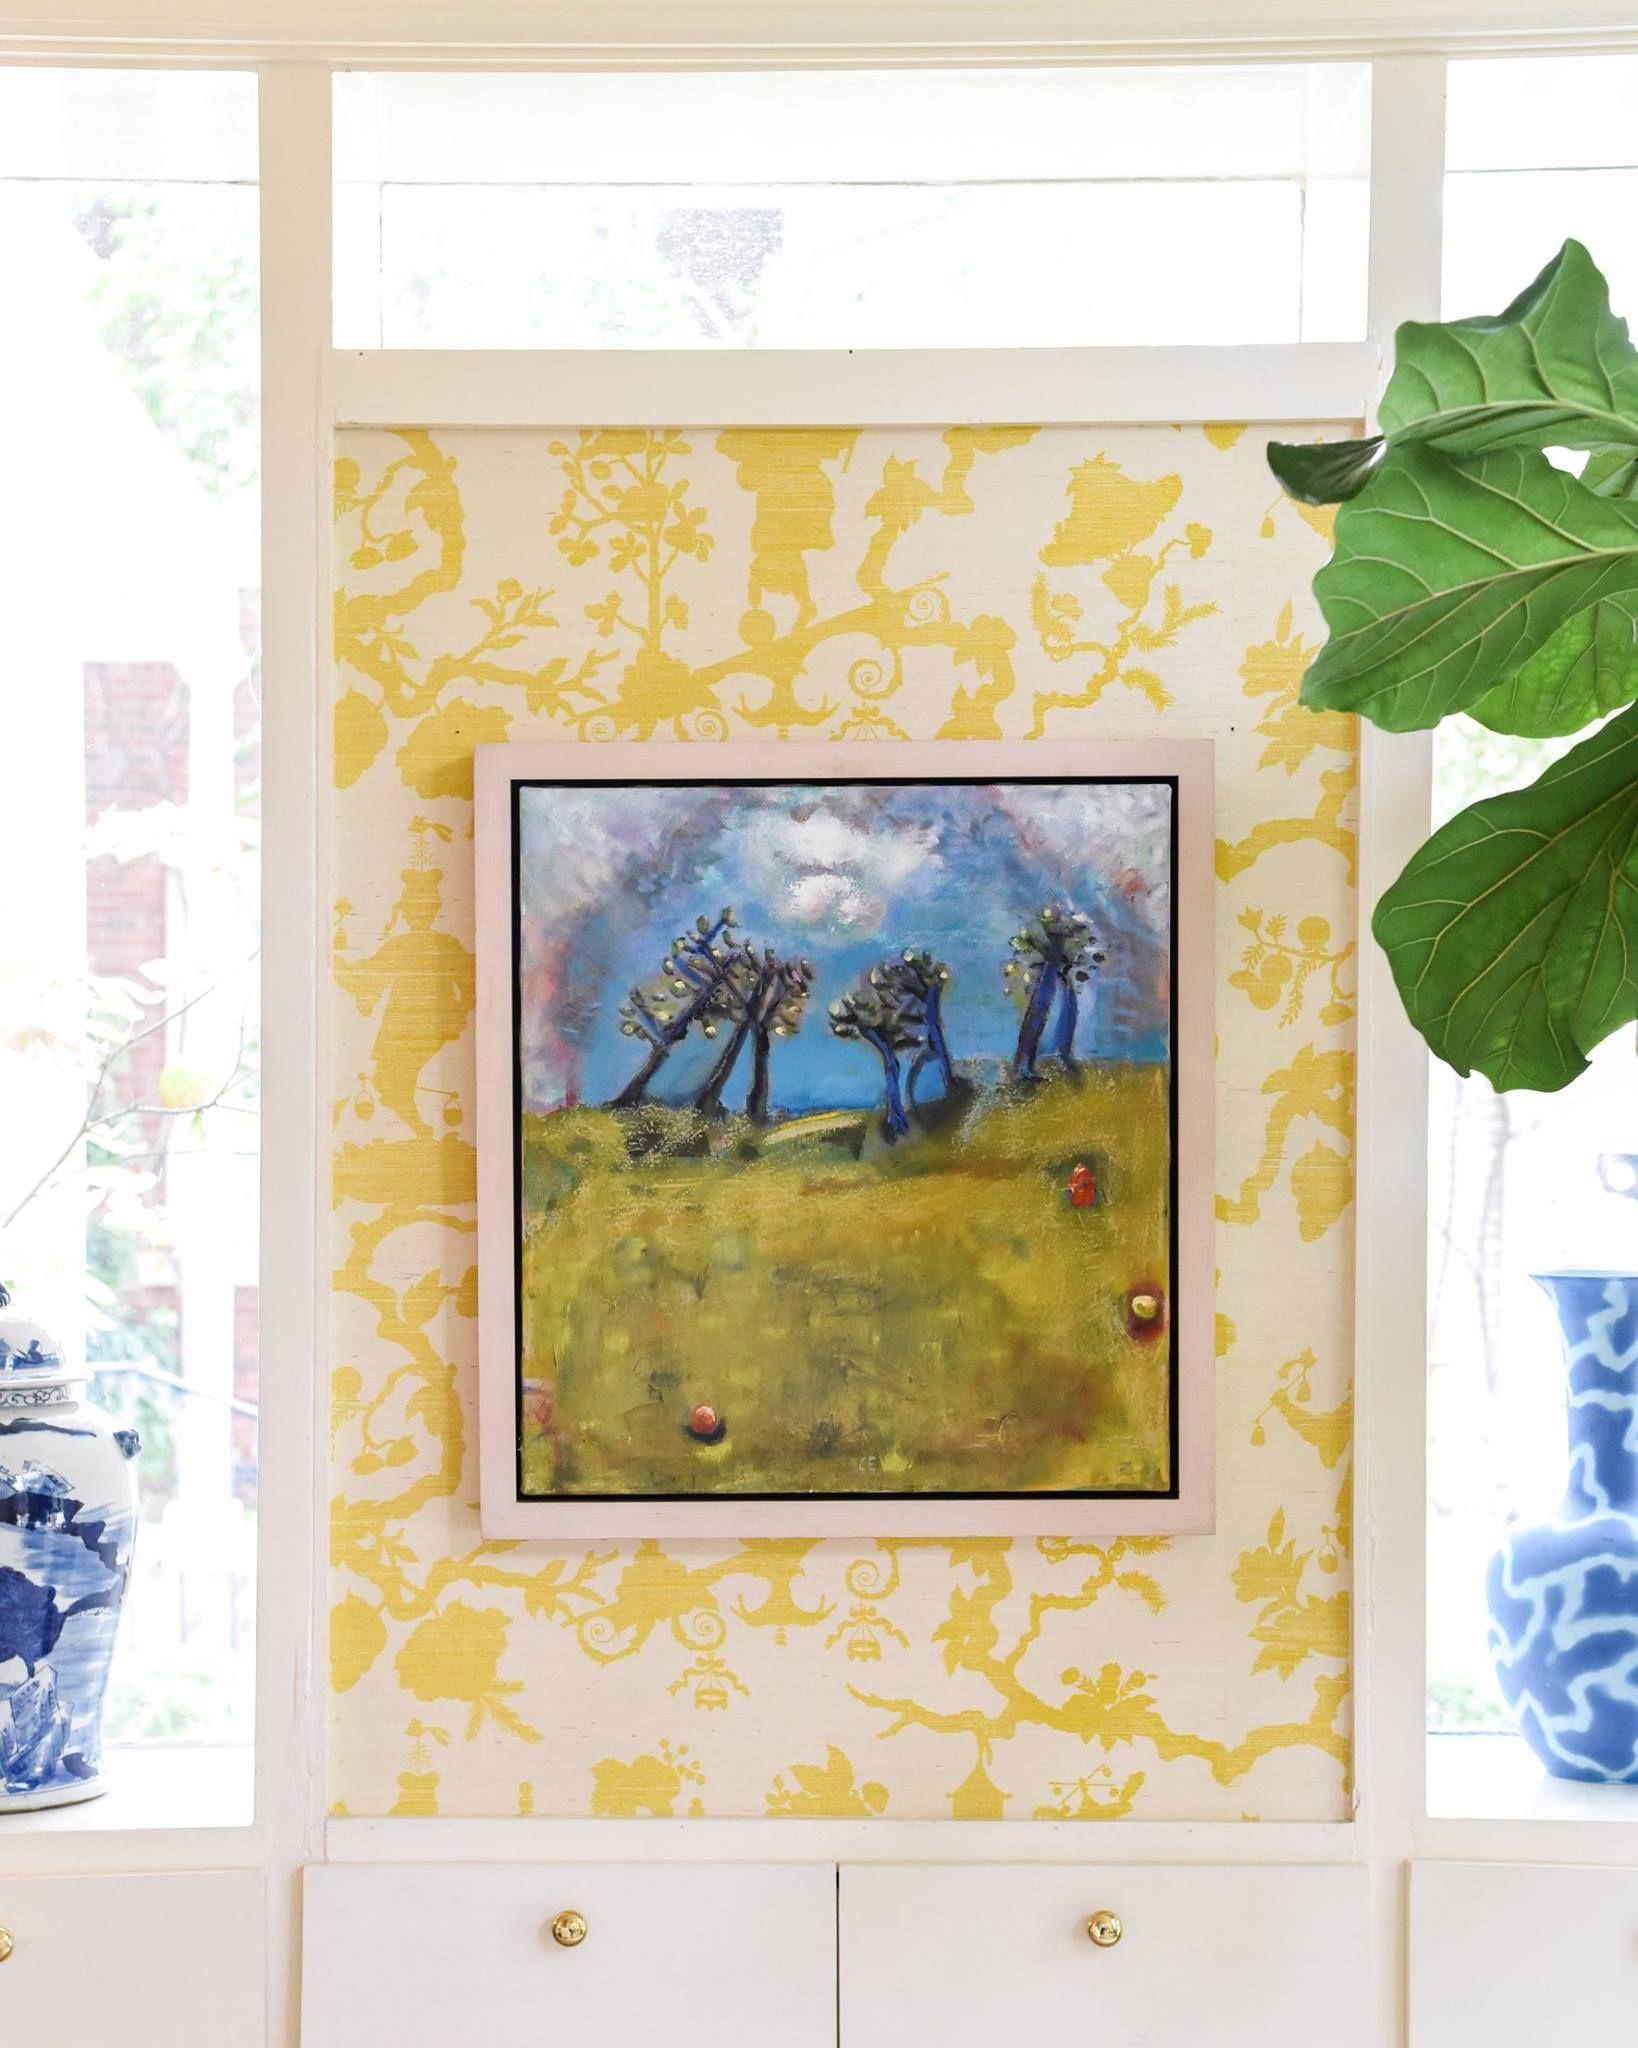 original art by carolyn evans sold at blue print | yellow grasscloth ...